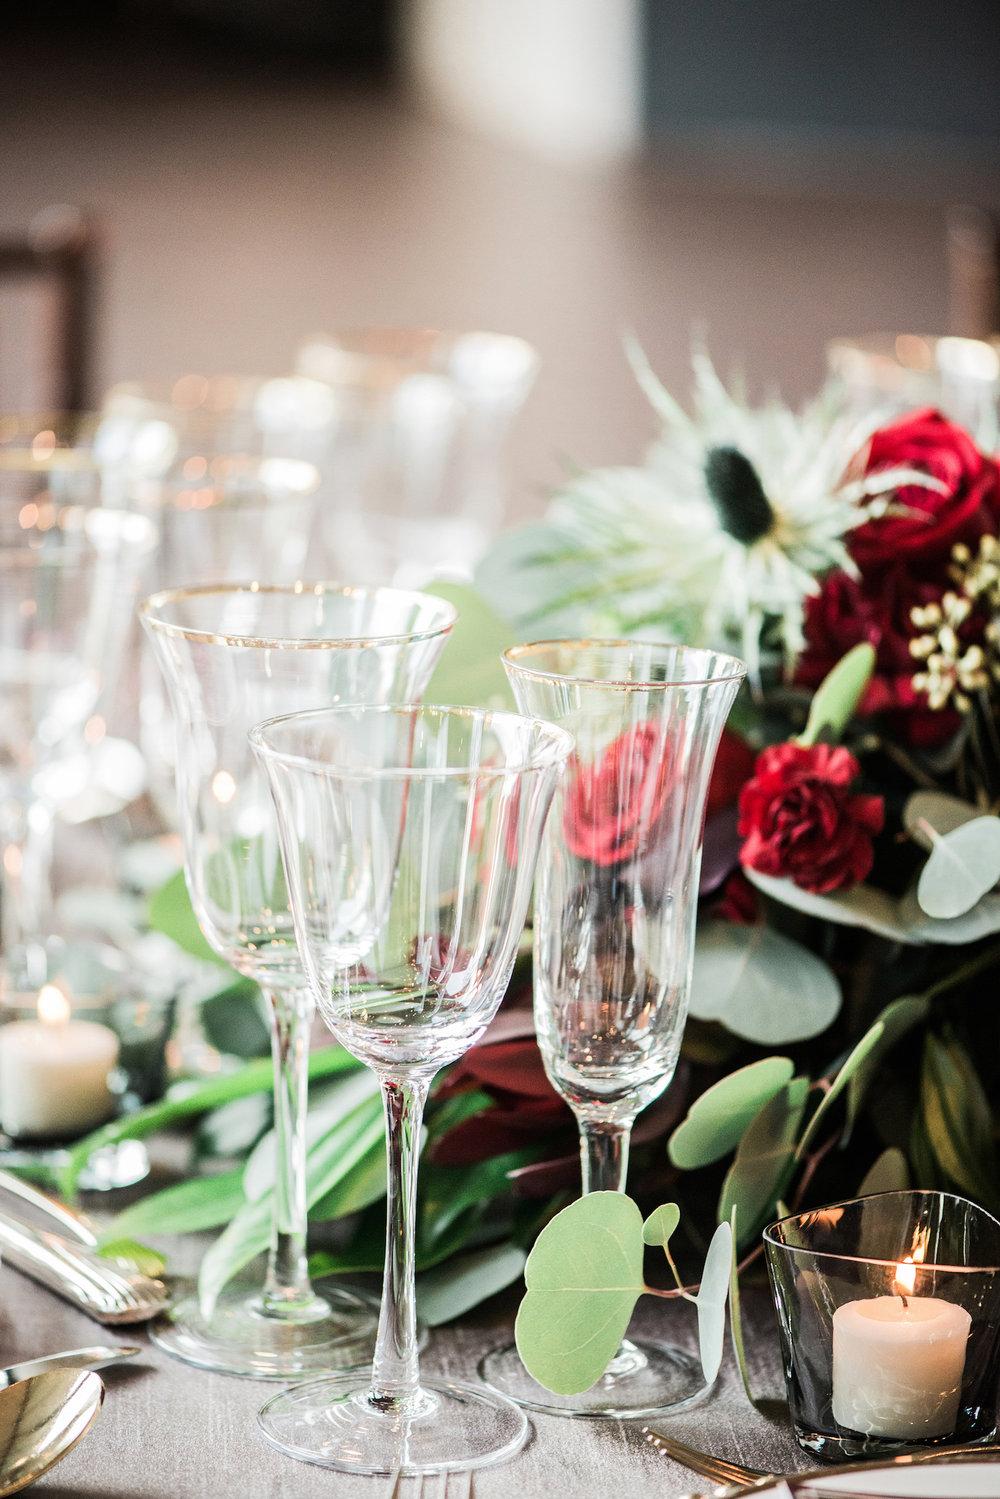 romantic-vintage-wedding-urban-venue-glassware.jpg